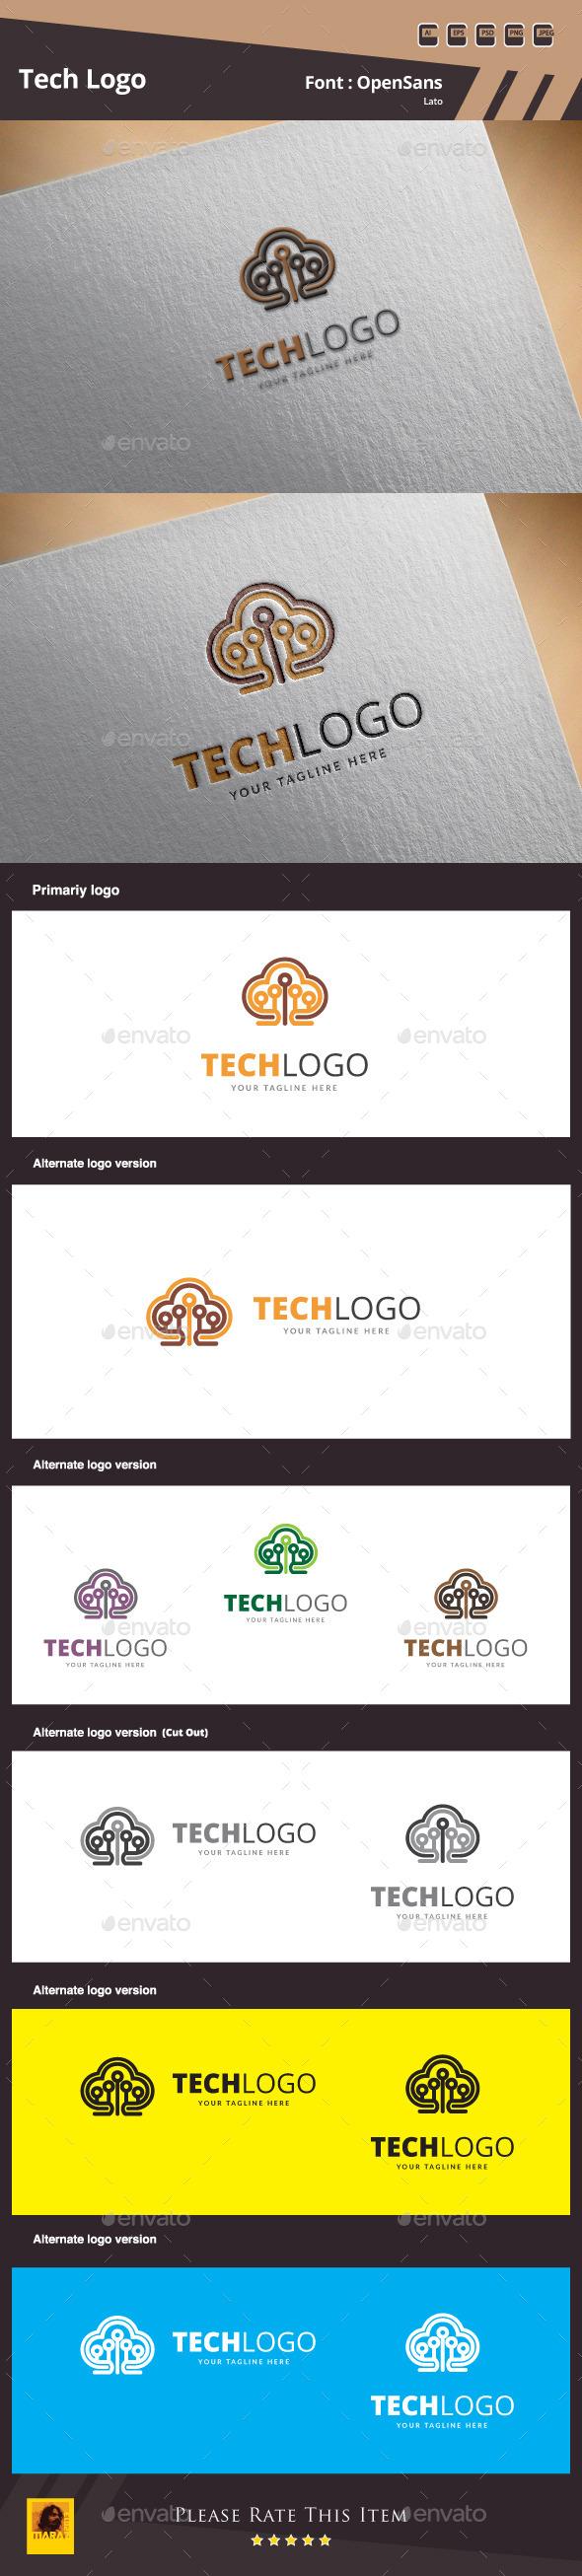 GraphicRiver Tech Logo Template 9962675